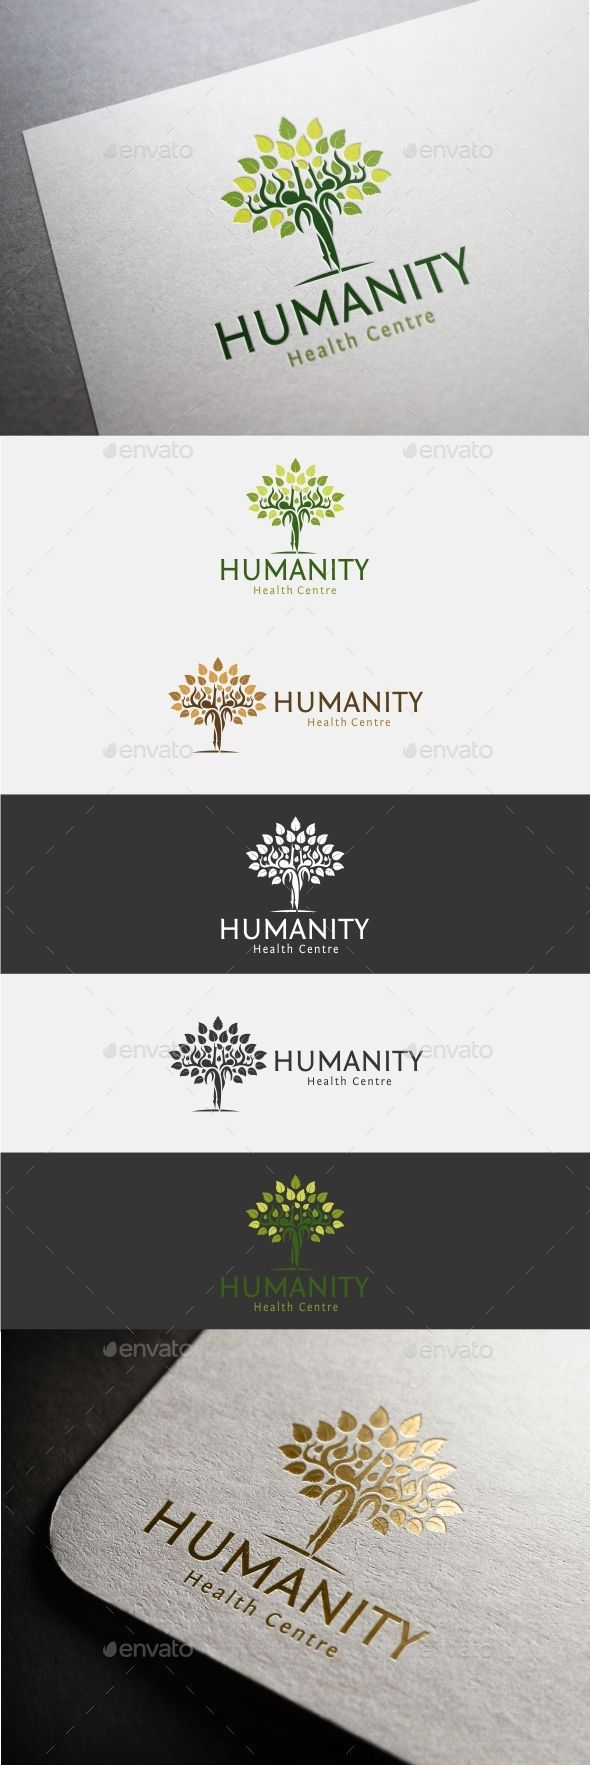 Human Tree Logo - Nature Logo Templates Download here : https://graphicriver.net/item/human-tree-logo/18690341?s_rank=108&ref=Al-fatih